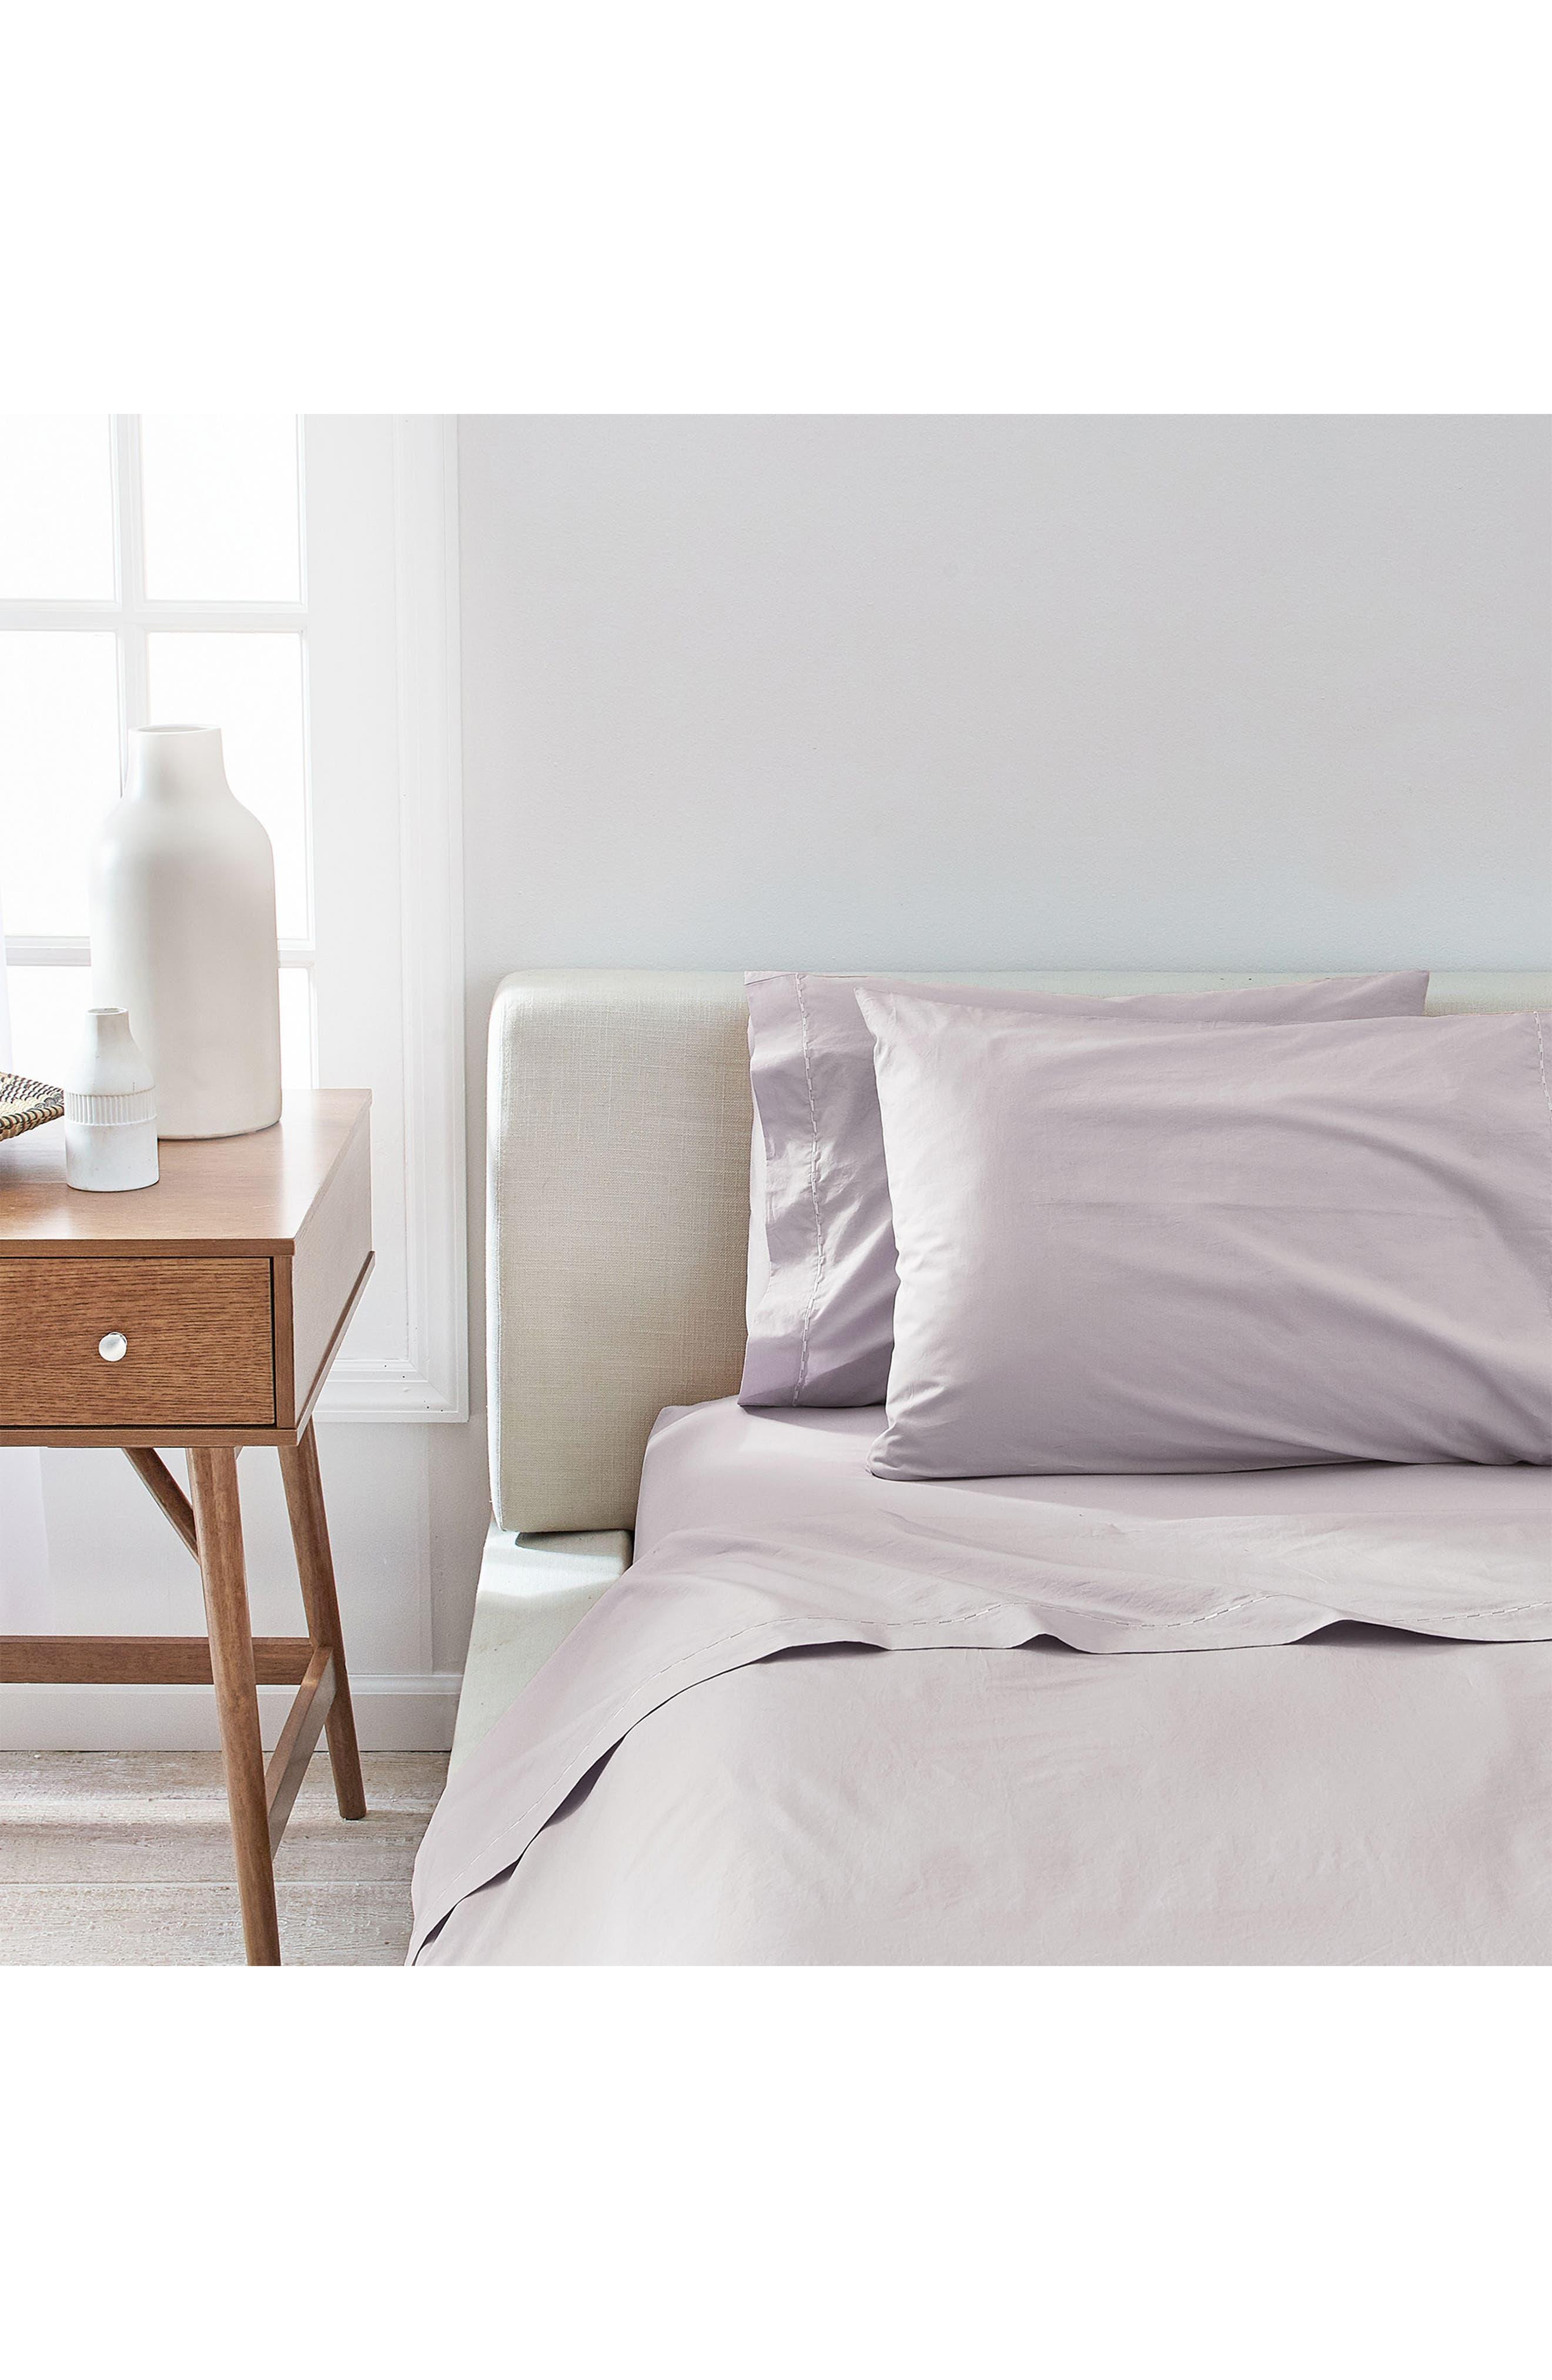 SPLENDID HOME DECOR,                             Spendid Home Decor Cotton Percale Pillowcases,                             Alternate thumbnail 3, color,                             MIST